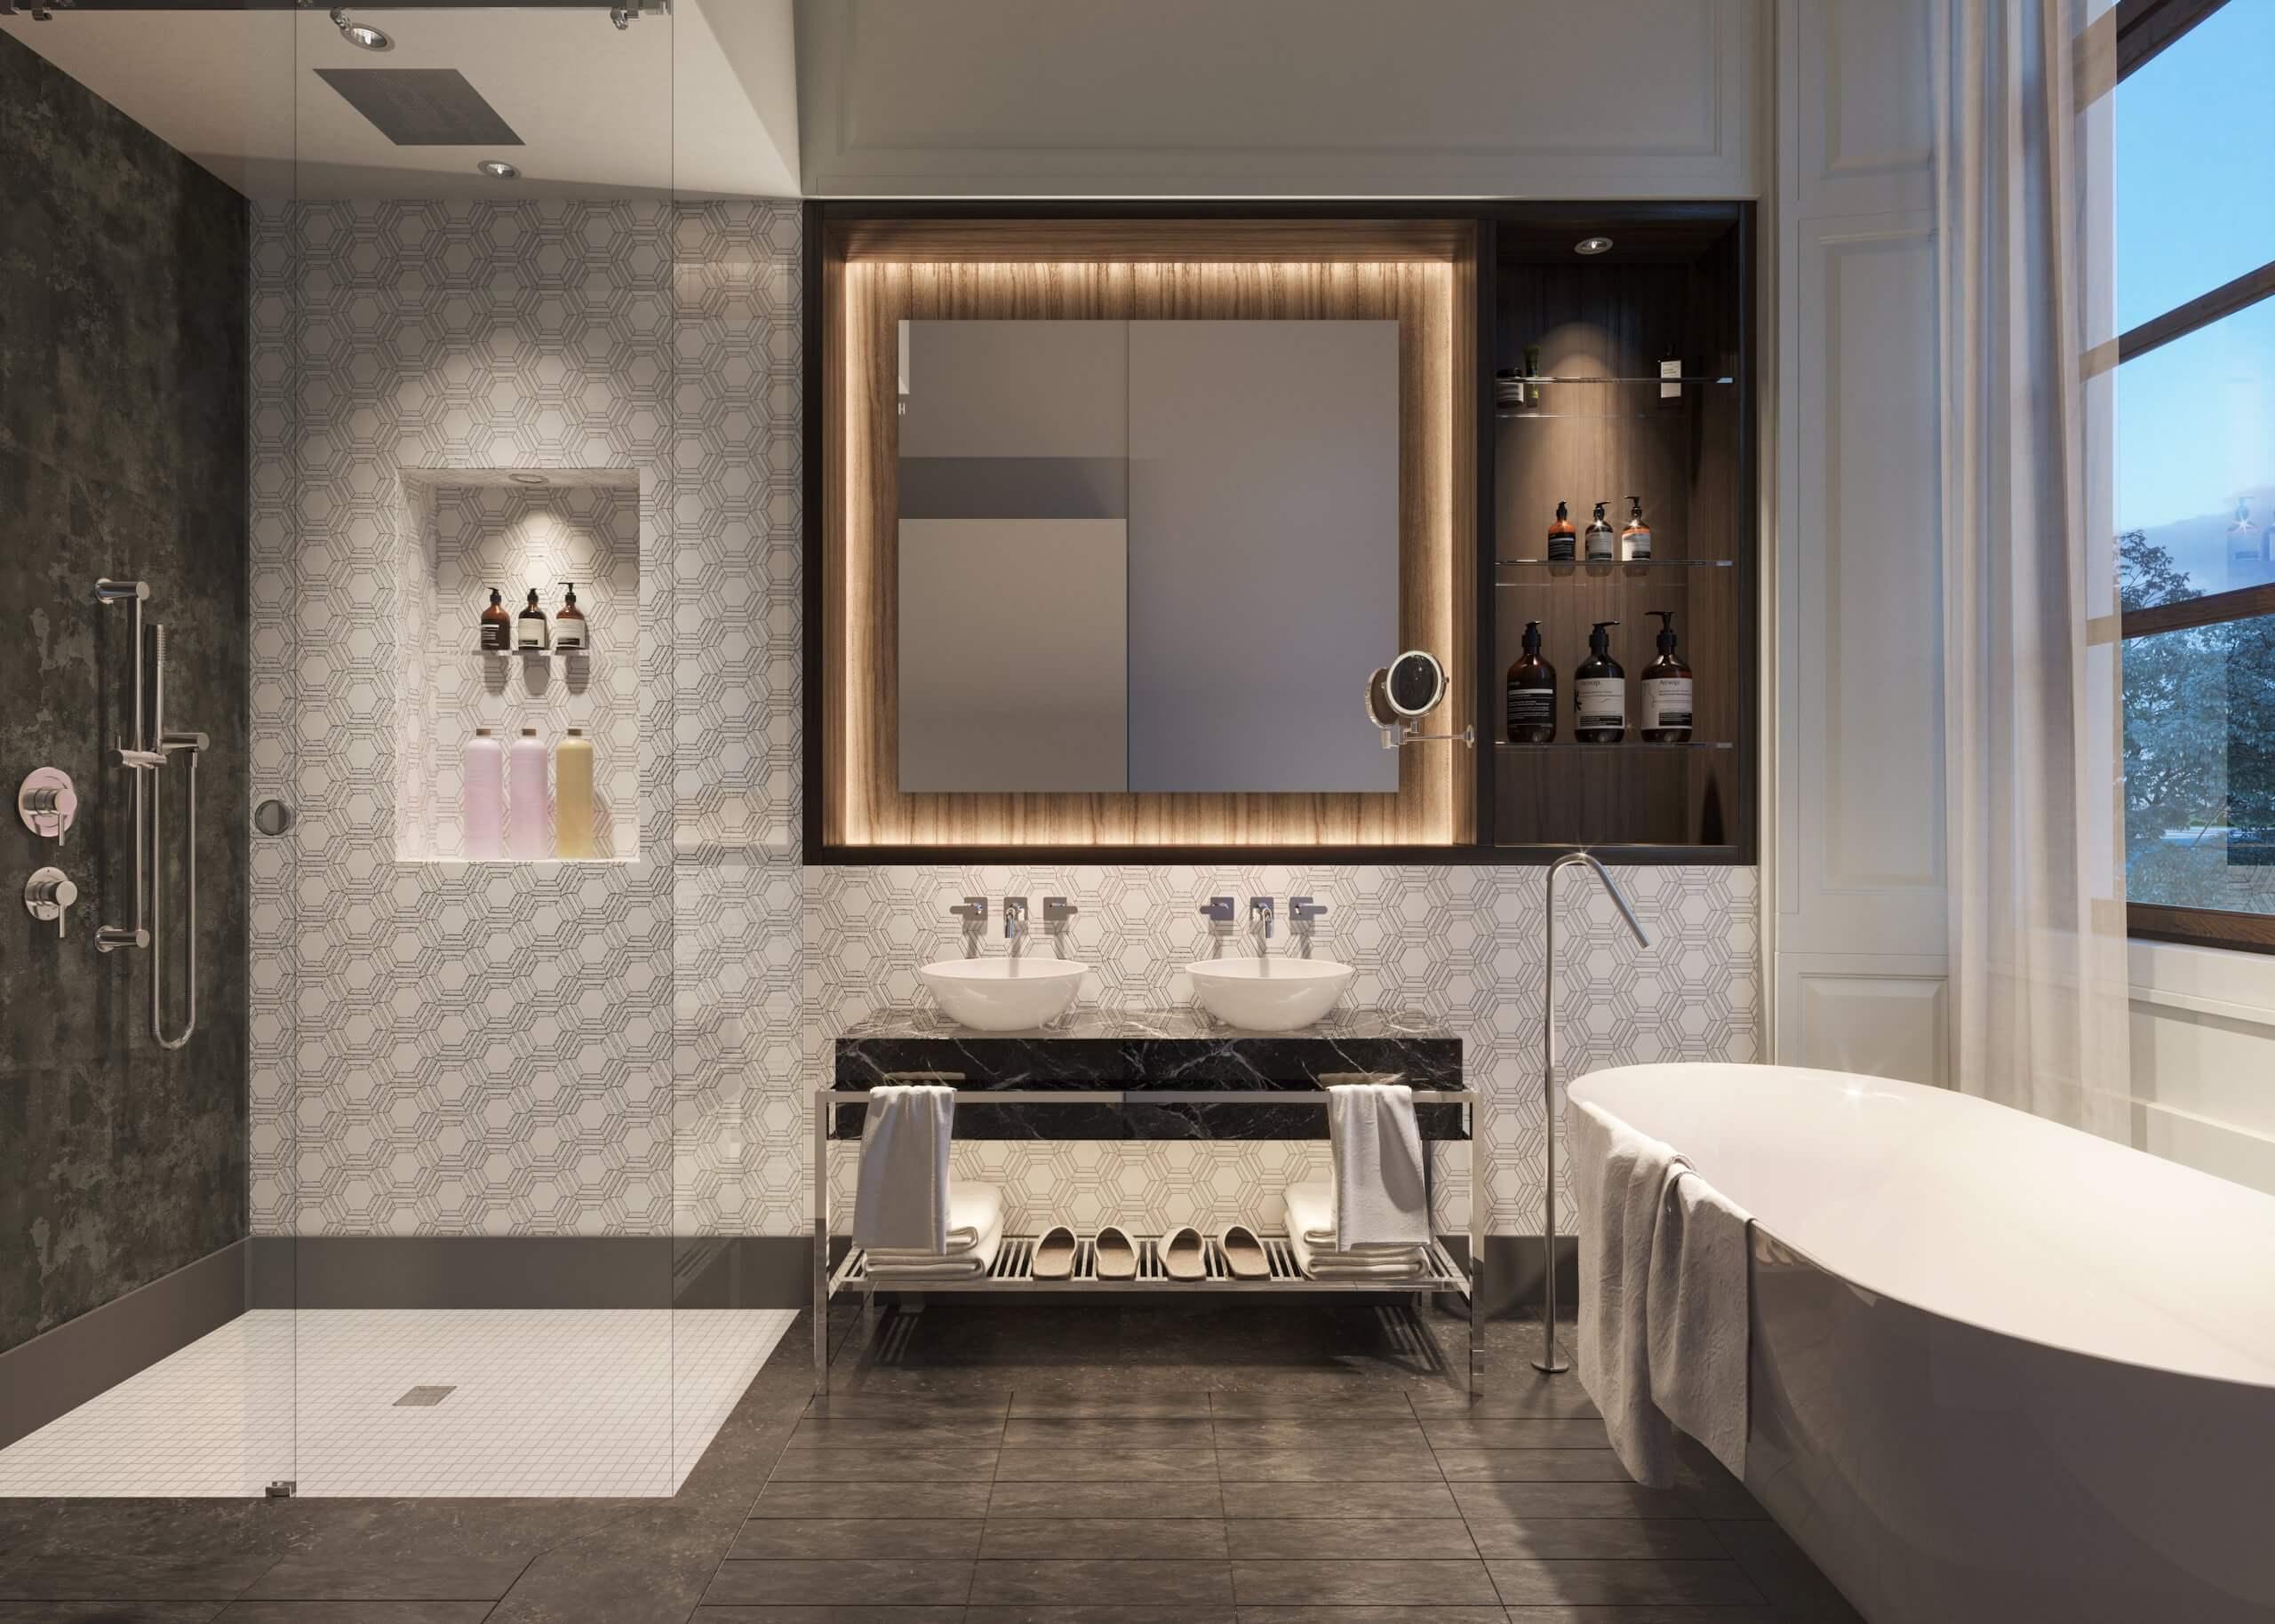 Hotel-Metropole_Room-123-Bathroom_R02